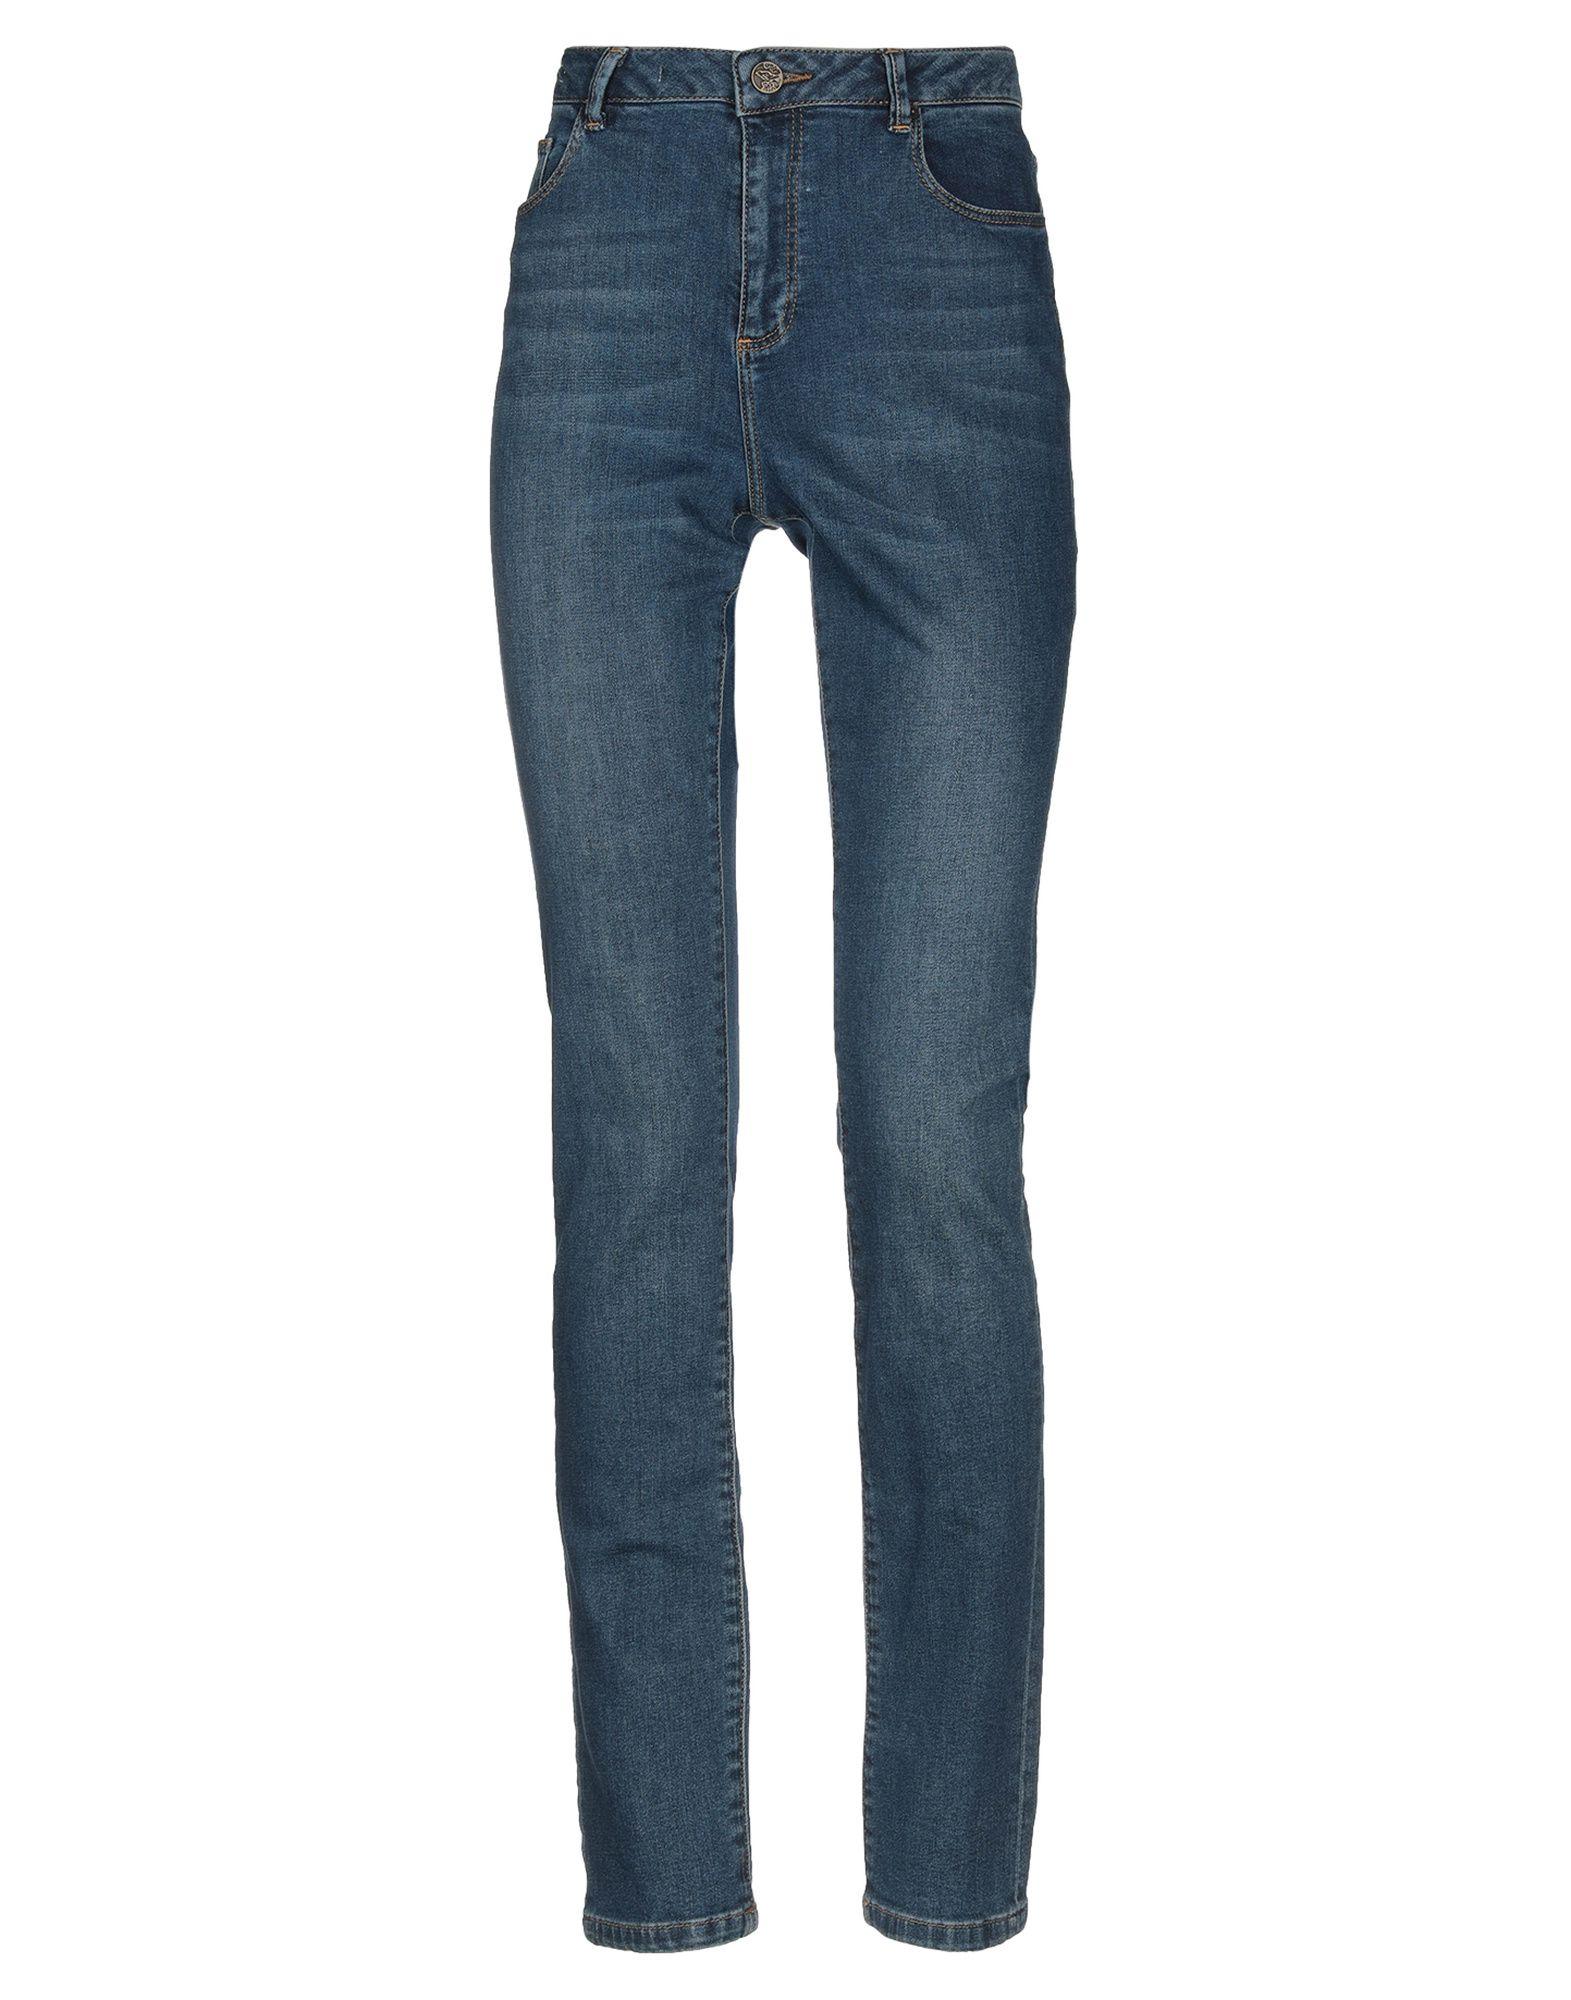 NICE THINGS by PALOMA S. Джинсовые брюки nice things by paloma s джинсовые брюки